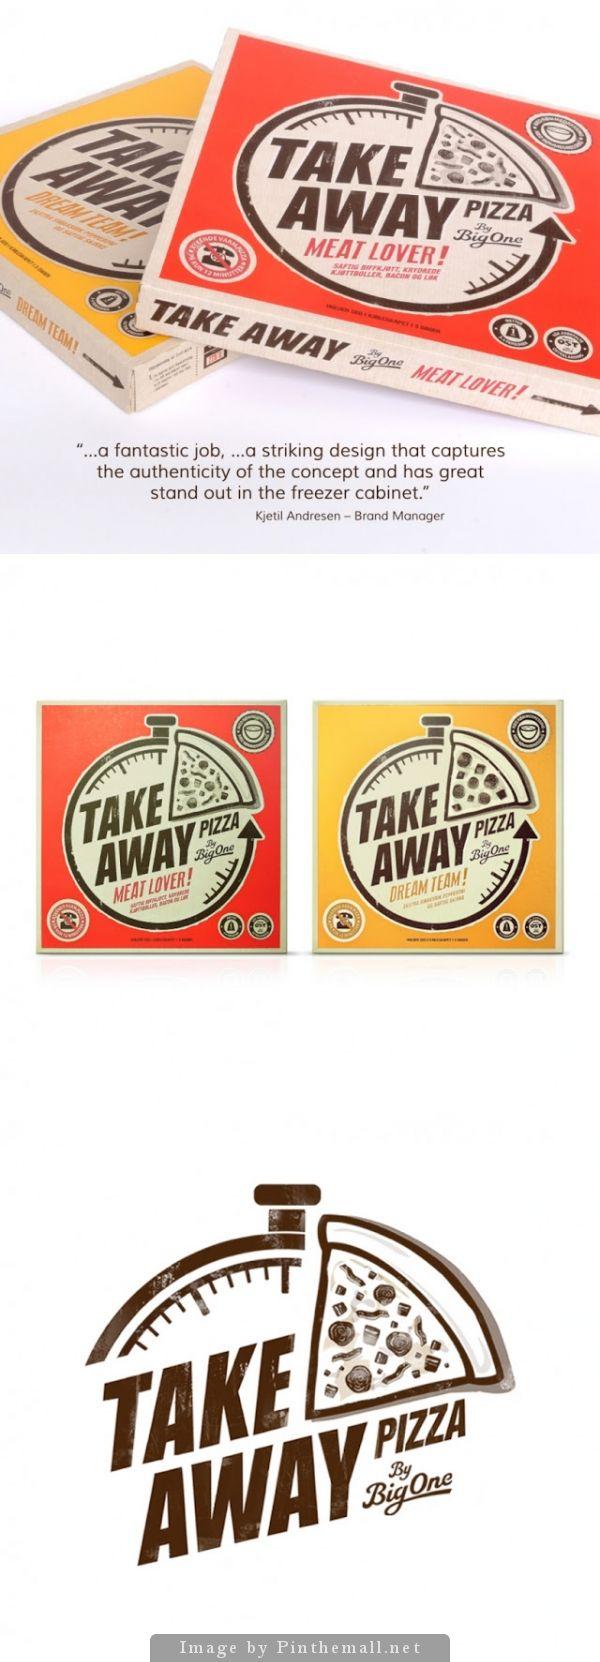 Take Away Pizza Packaging   Designer: Big One #Branding #Packaging #Design